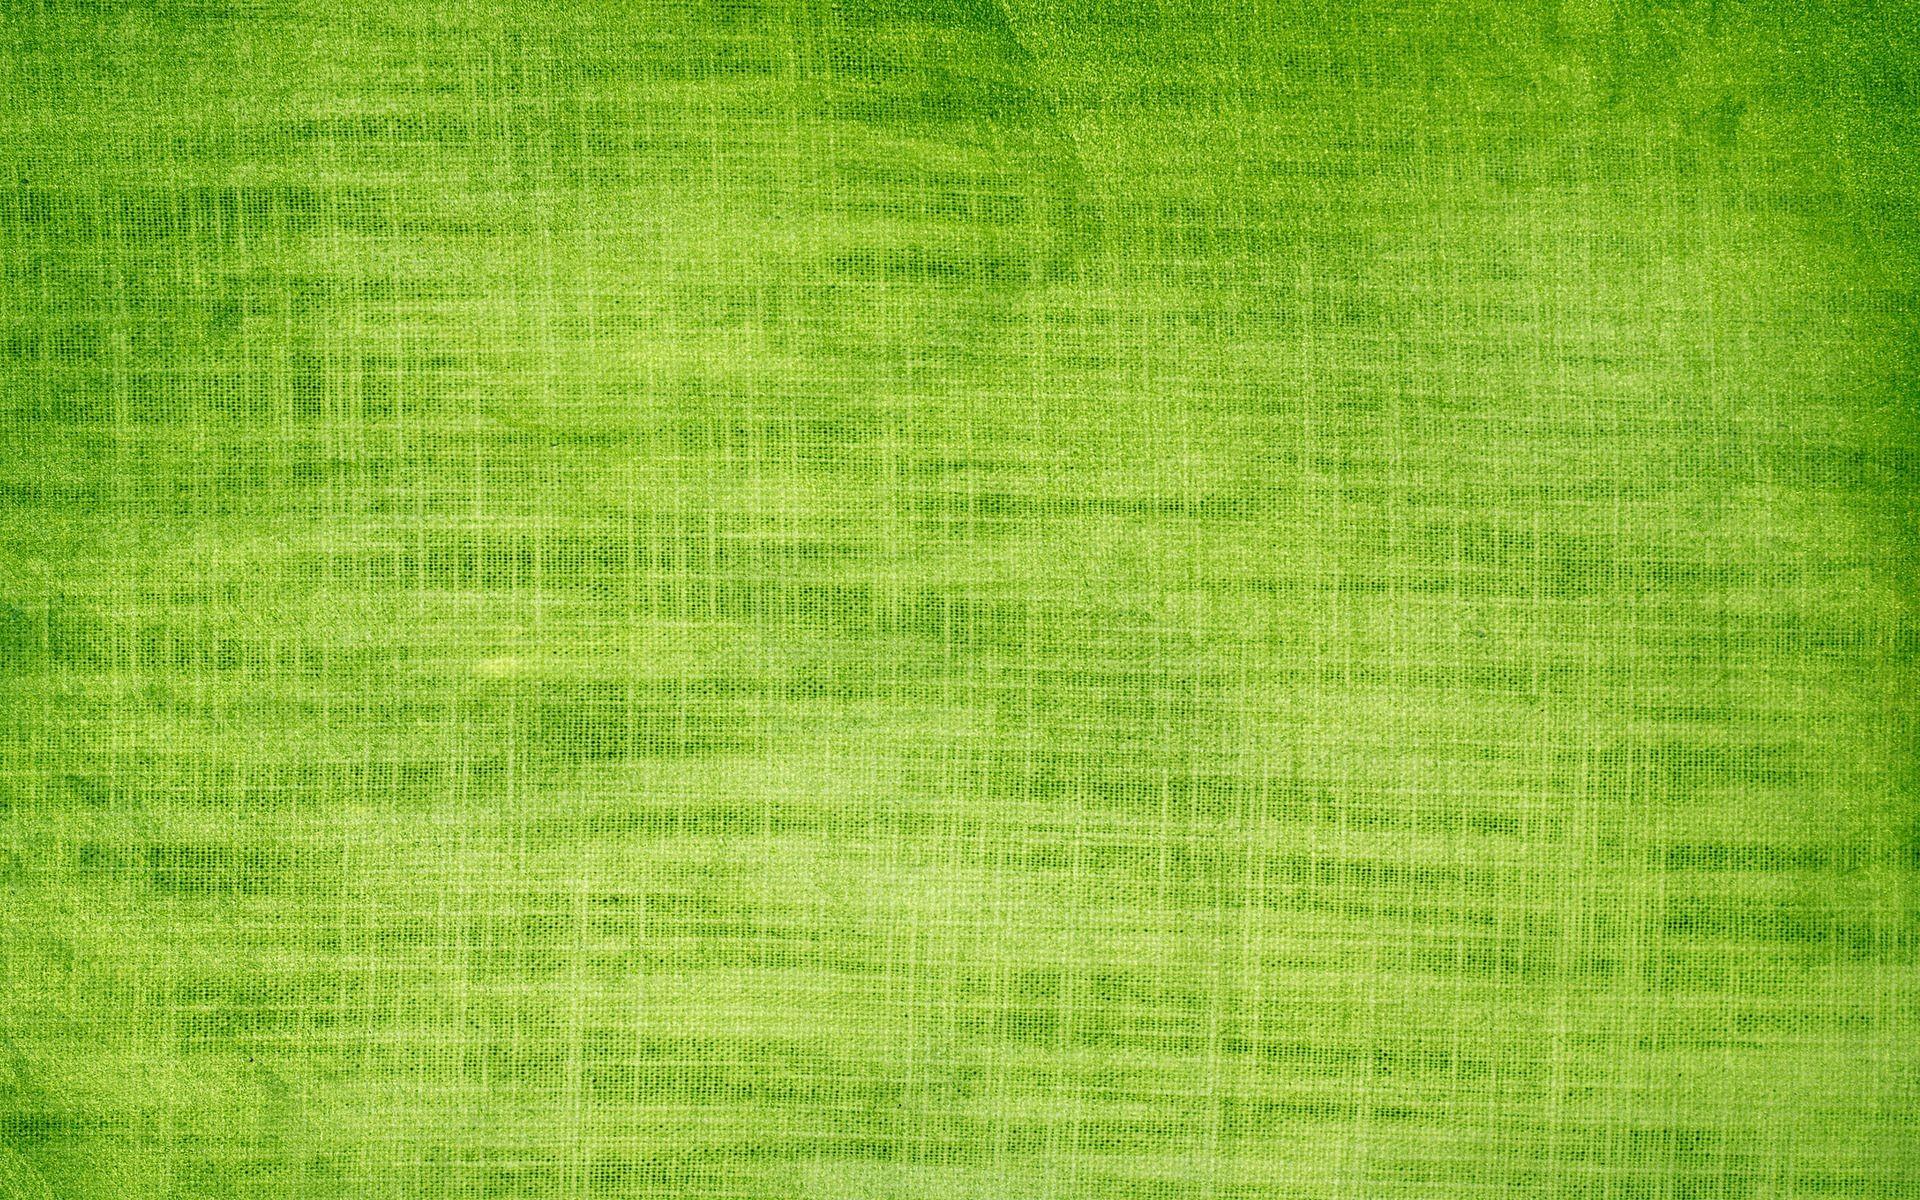 Weekly Wallpaper: Resurface Your Desktop With Beautiful Textures .